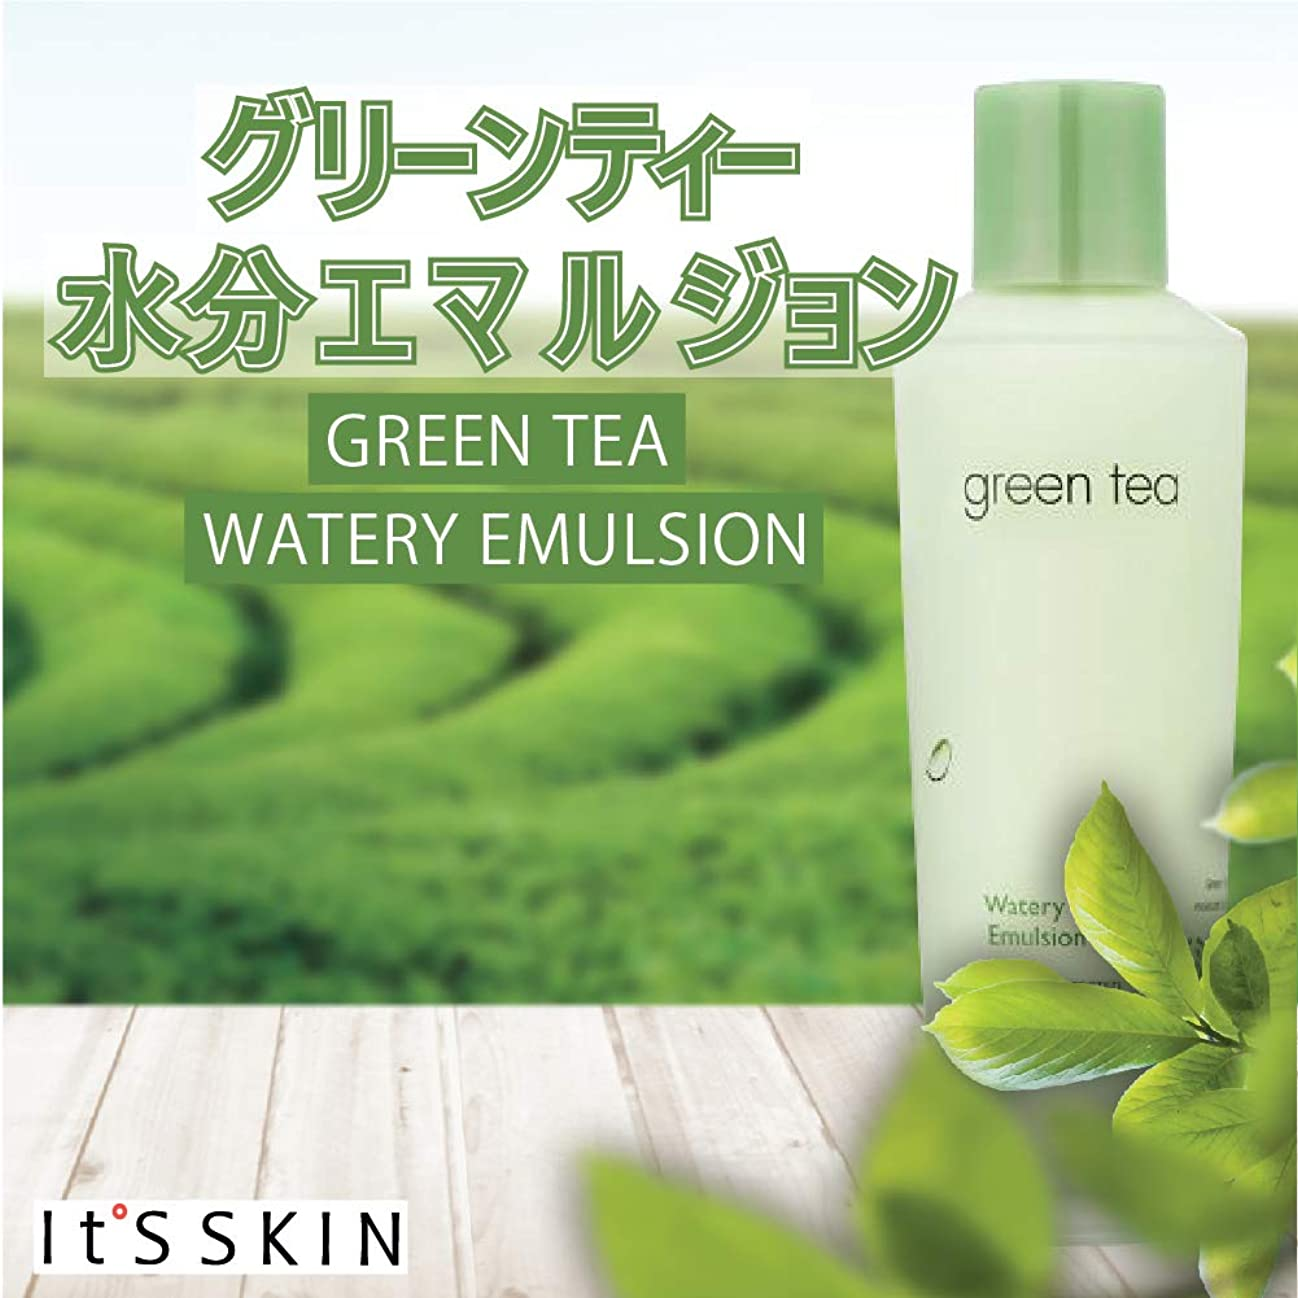 It's SKIN イッツスキン グリーン ティー ウォーターリー 乳液 Green Tea Watery Emulasion 150g 【 水分 乳液 しっとり 保湿 キメ 韓国コスメ 】